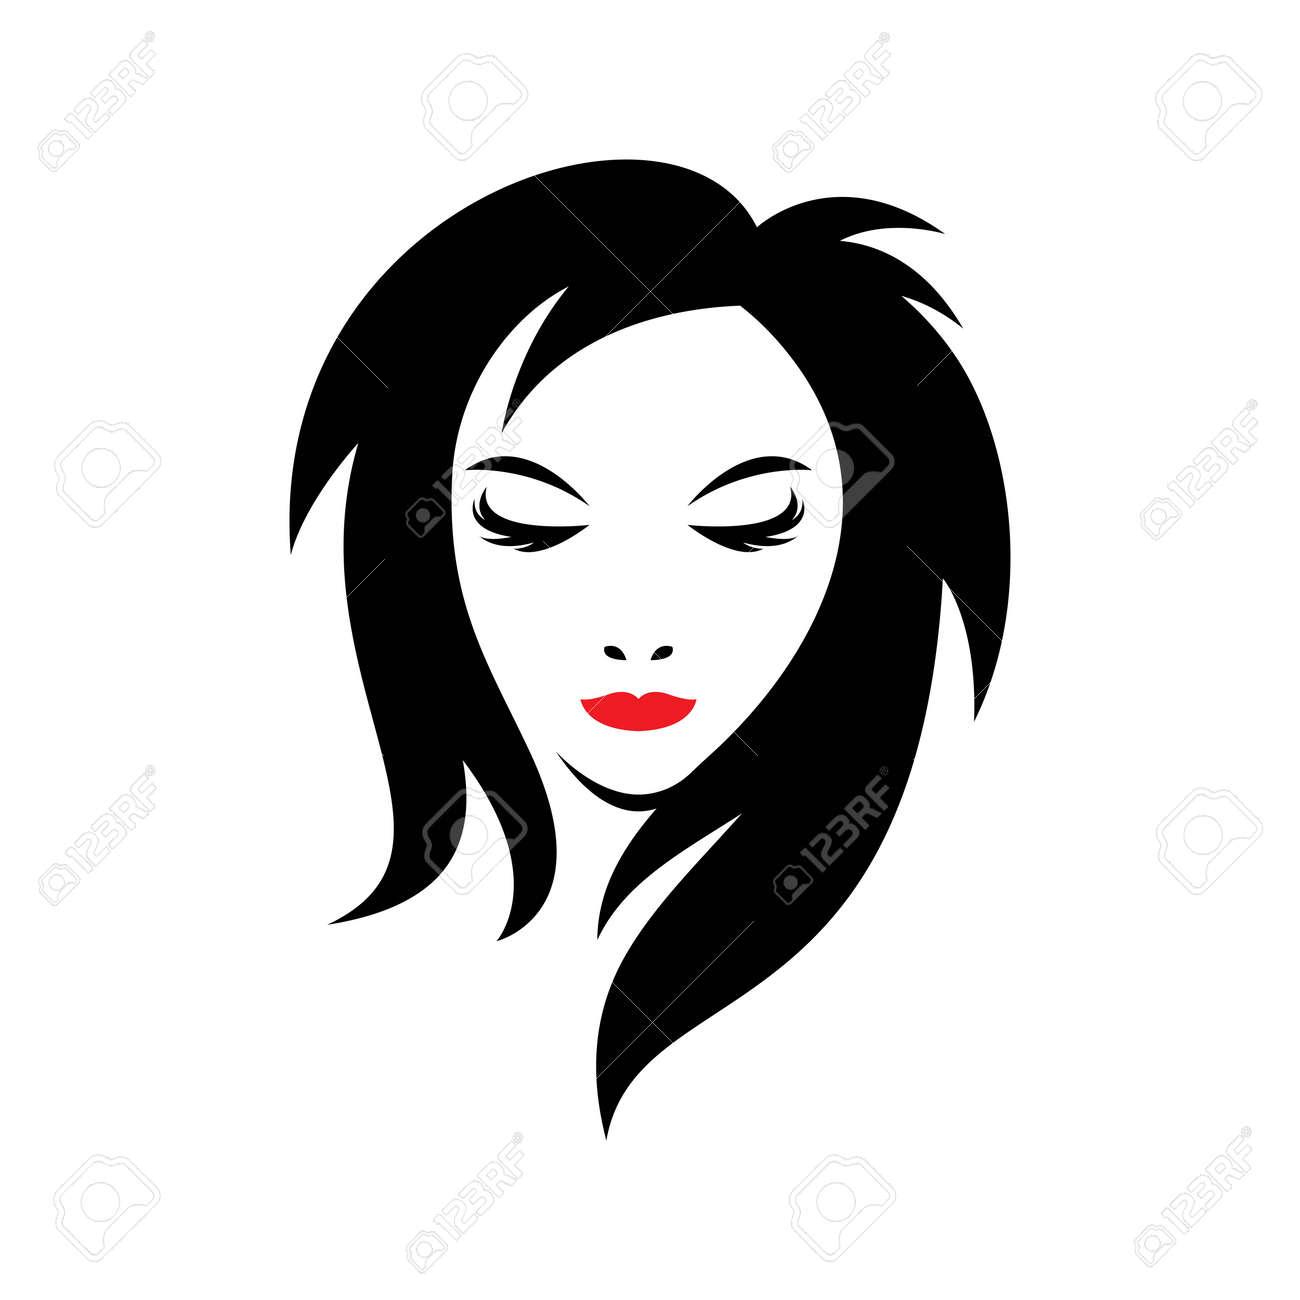 Beauty hair and salon logo images illustration design - 173289078